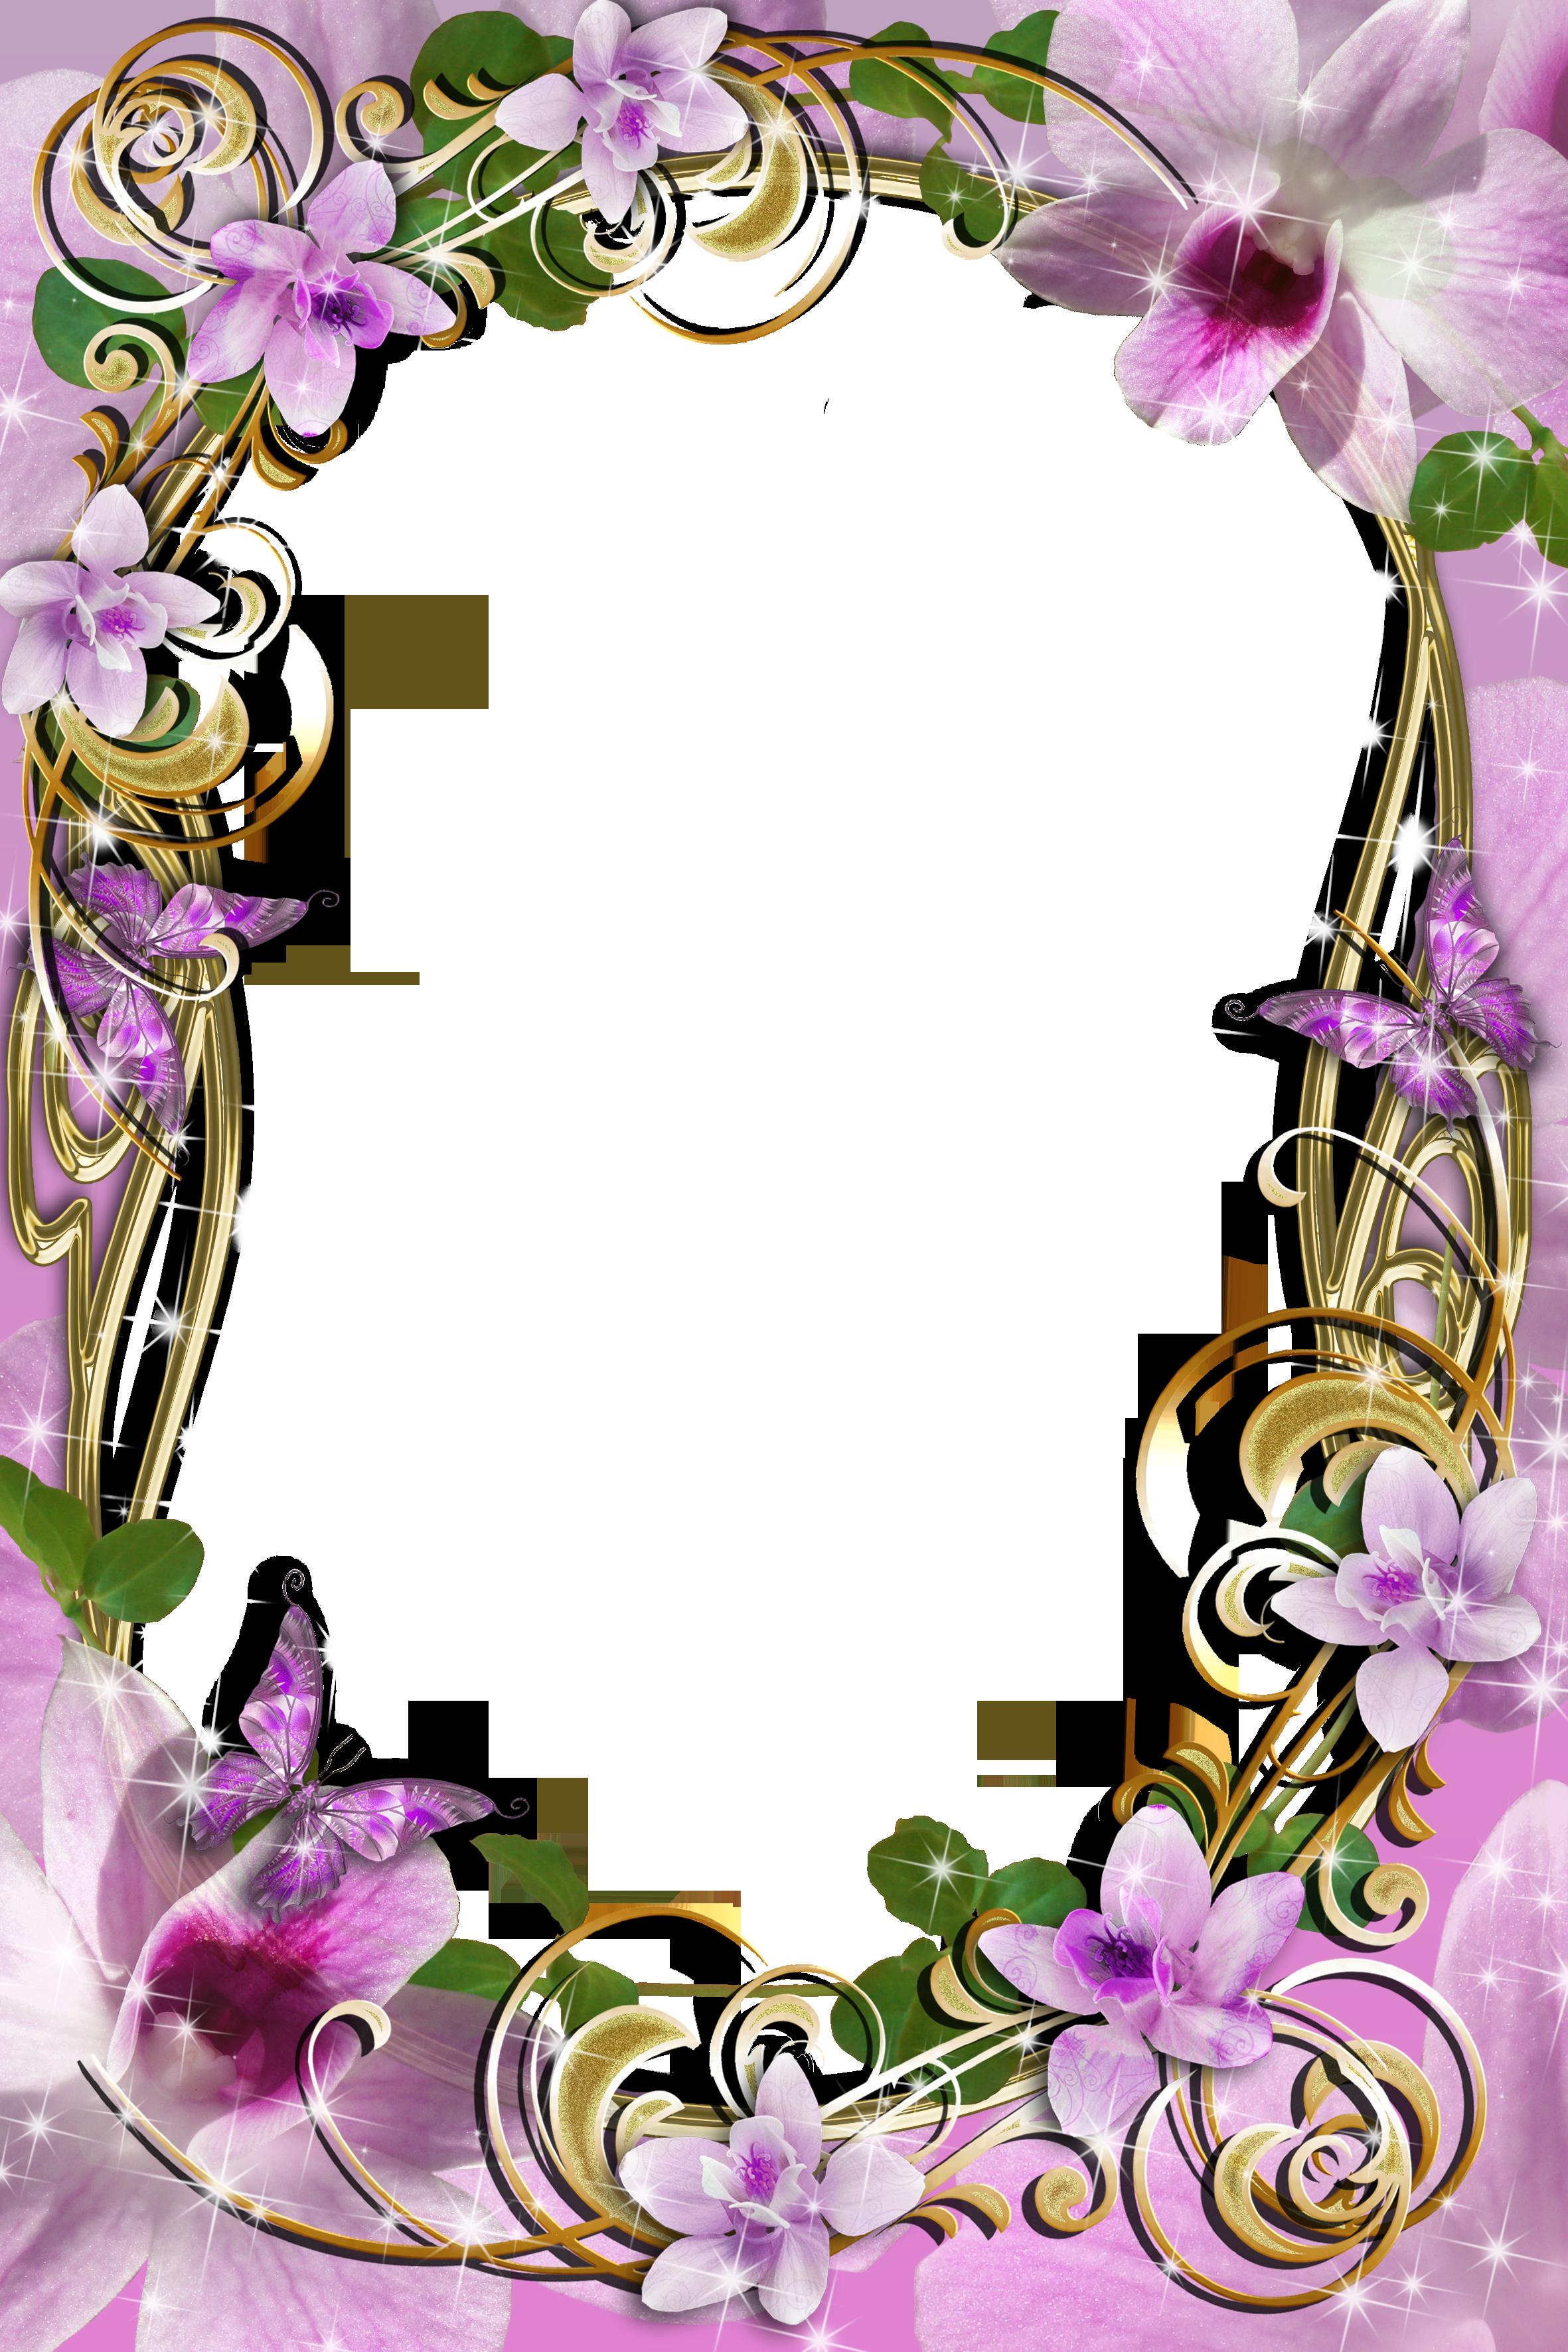 Pin by SHARLEAN M on PRETTY THINGS Flower frame, Flower